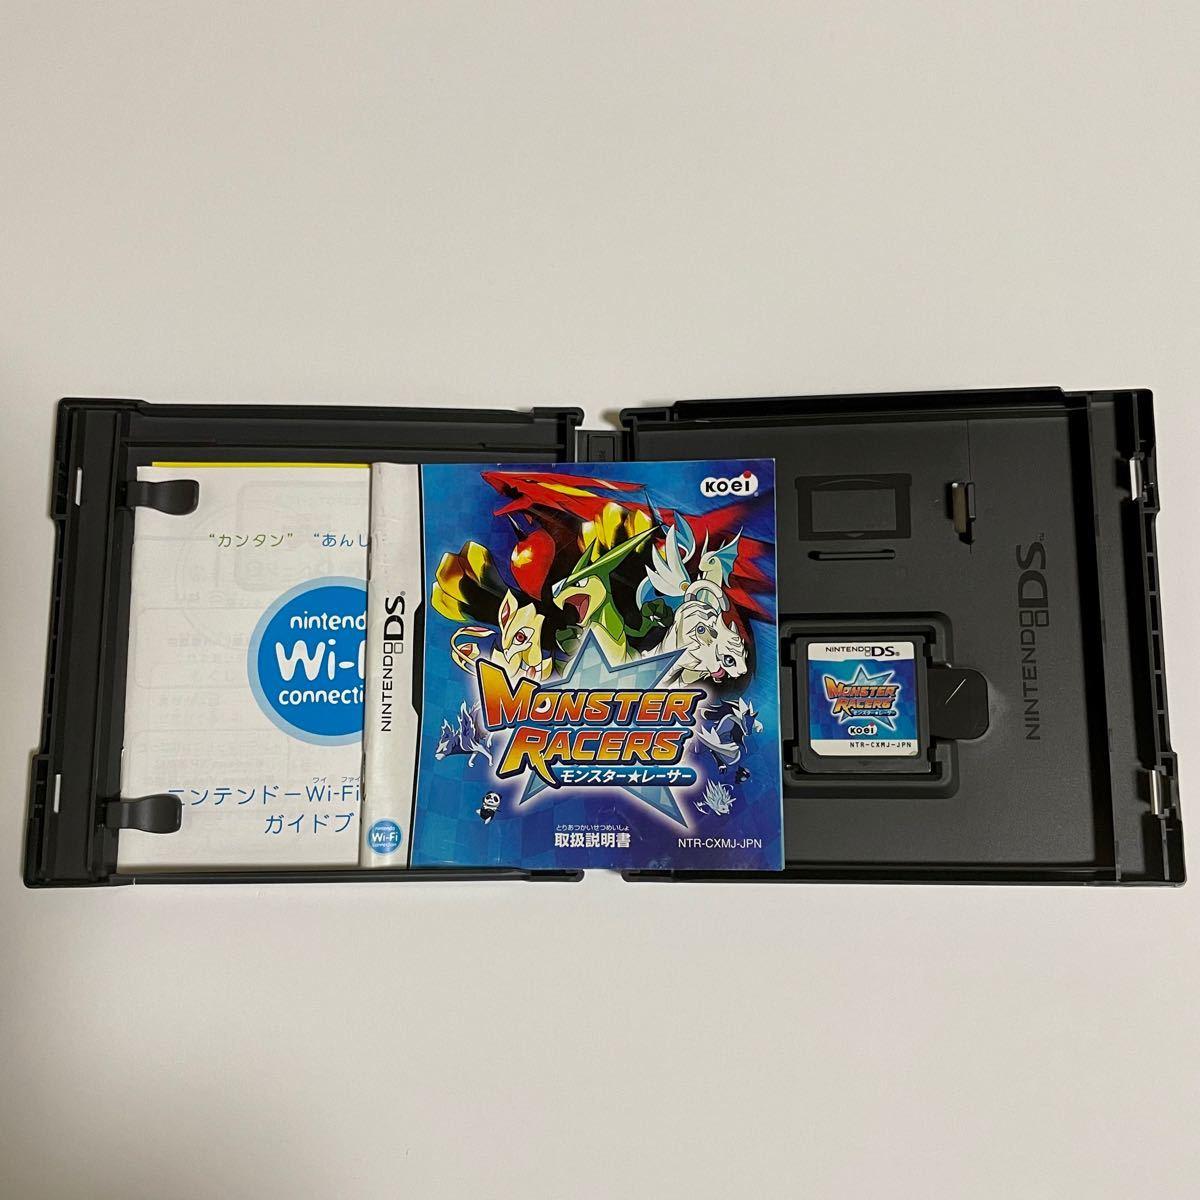 ds モンスターレーサー DSソフト ニンテンドー 任天堂